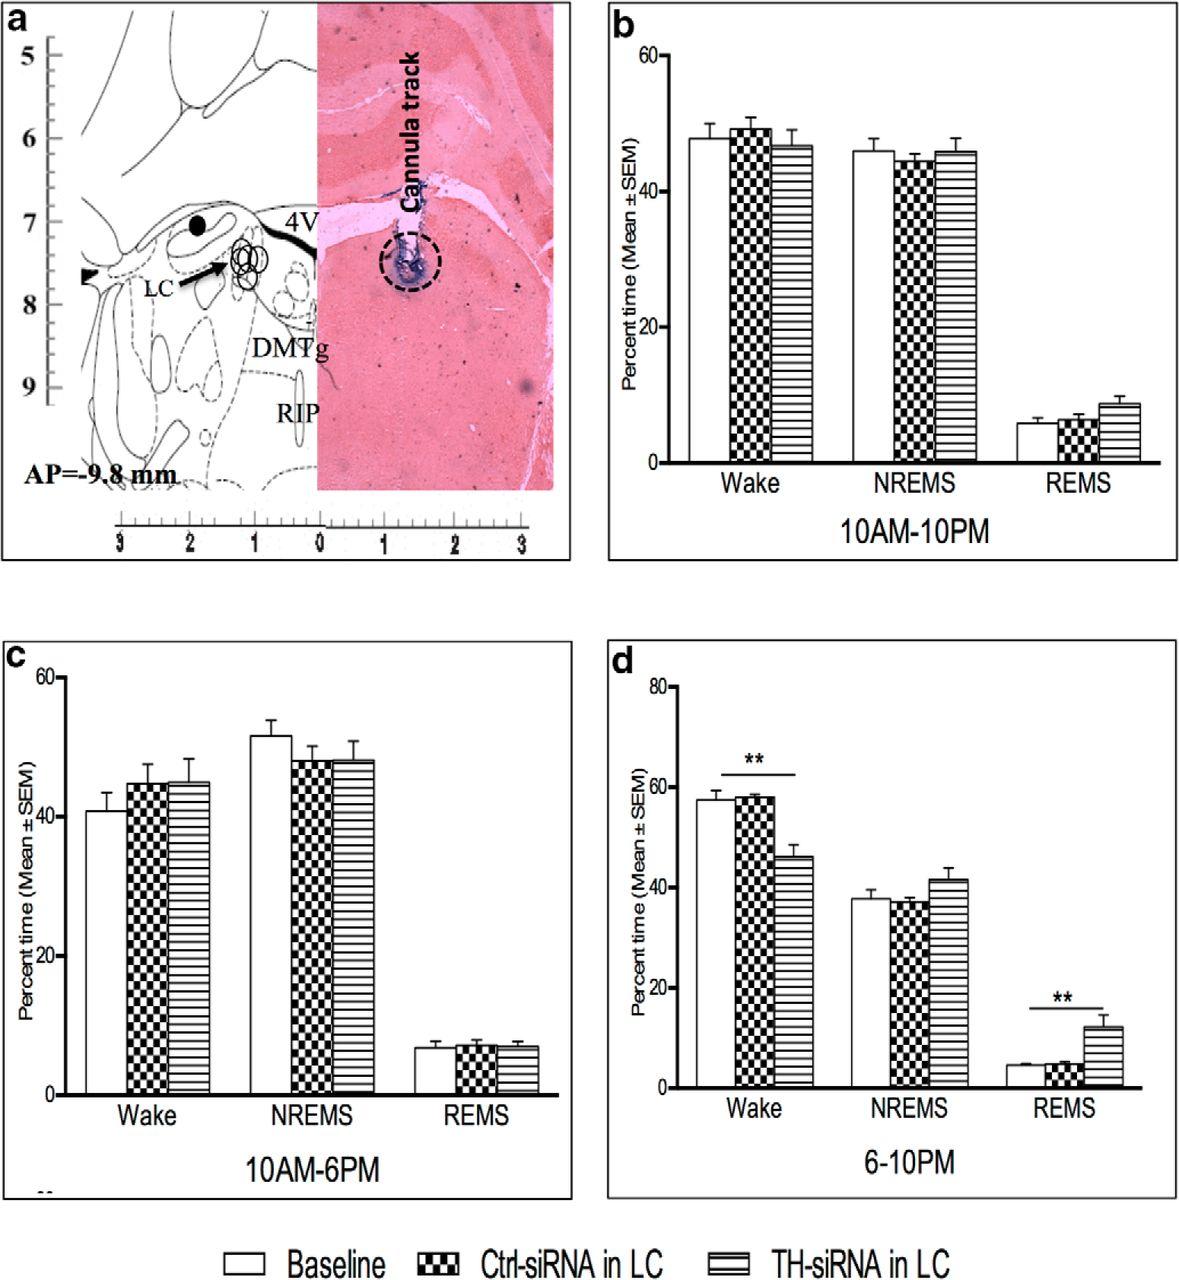 Noradrenaline from Locus Coeruleus Neurons Acts on Pedunculo-Pontine